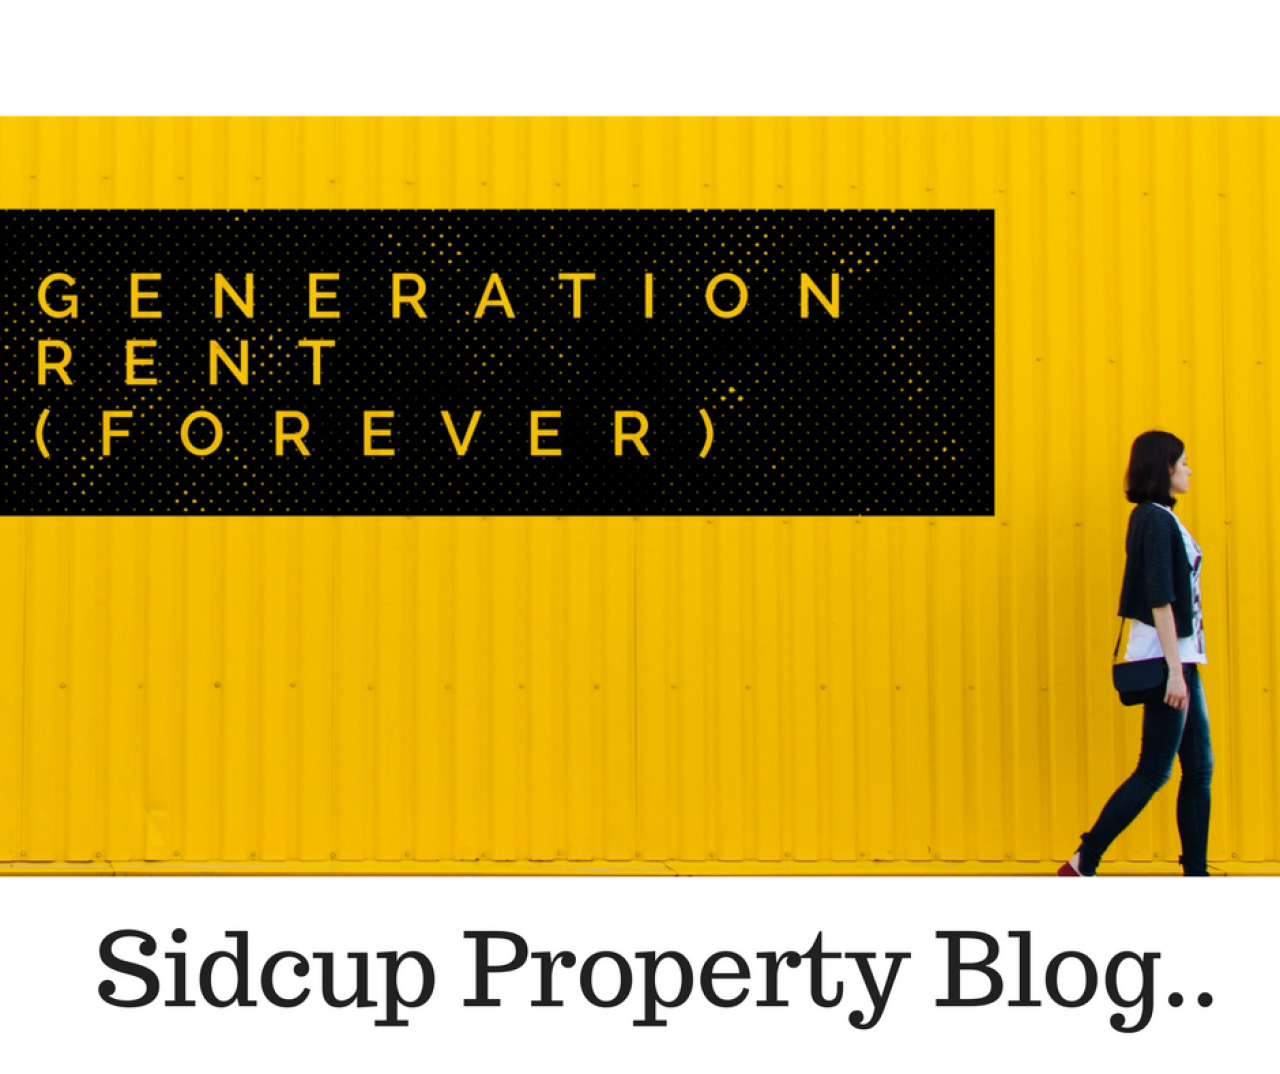 >'Generation Rent (Forever...